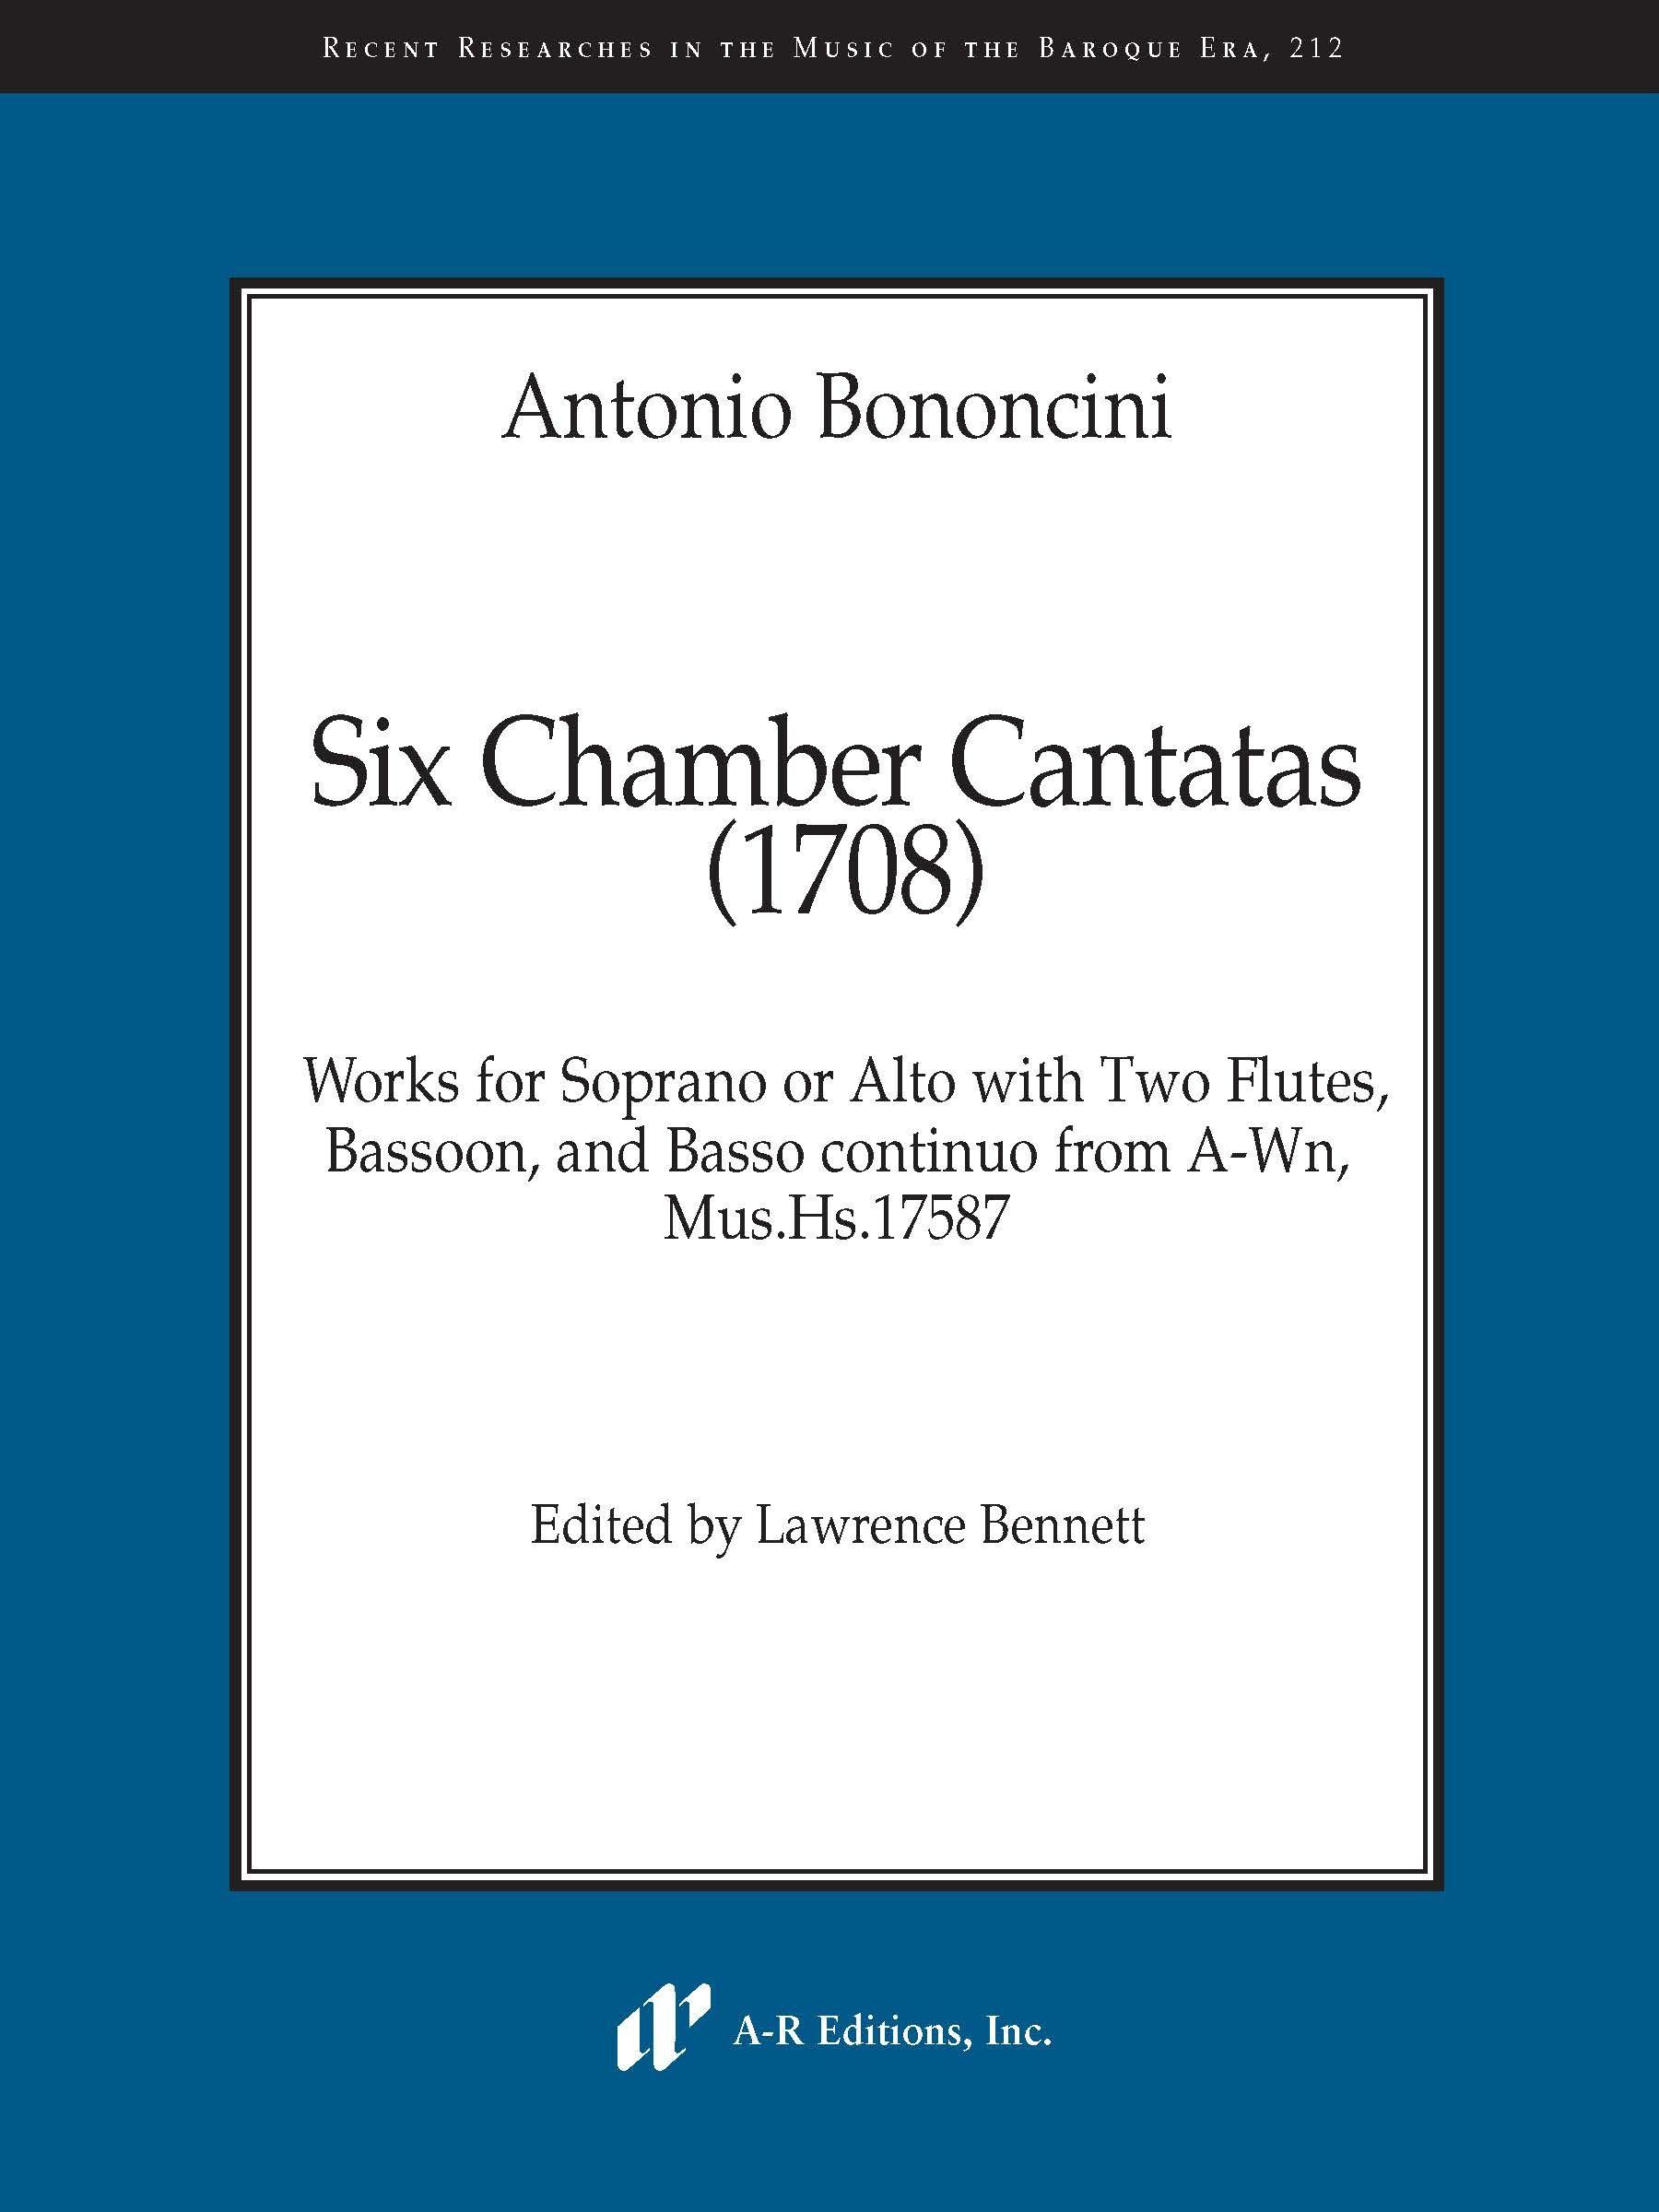 Bononcini: Six Chamber Cantatas (1708)